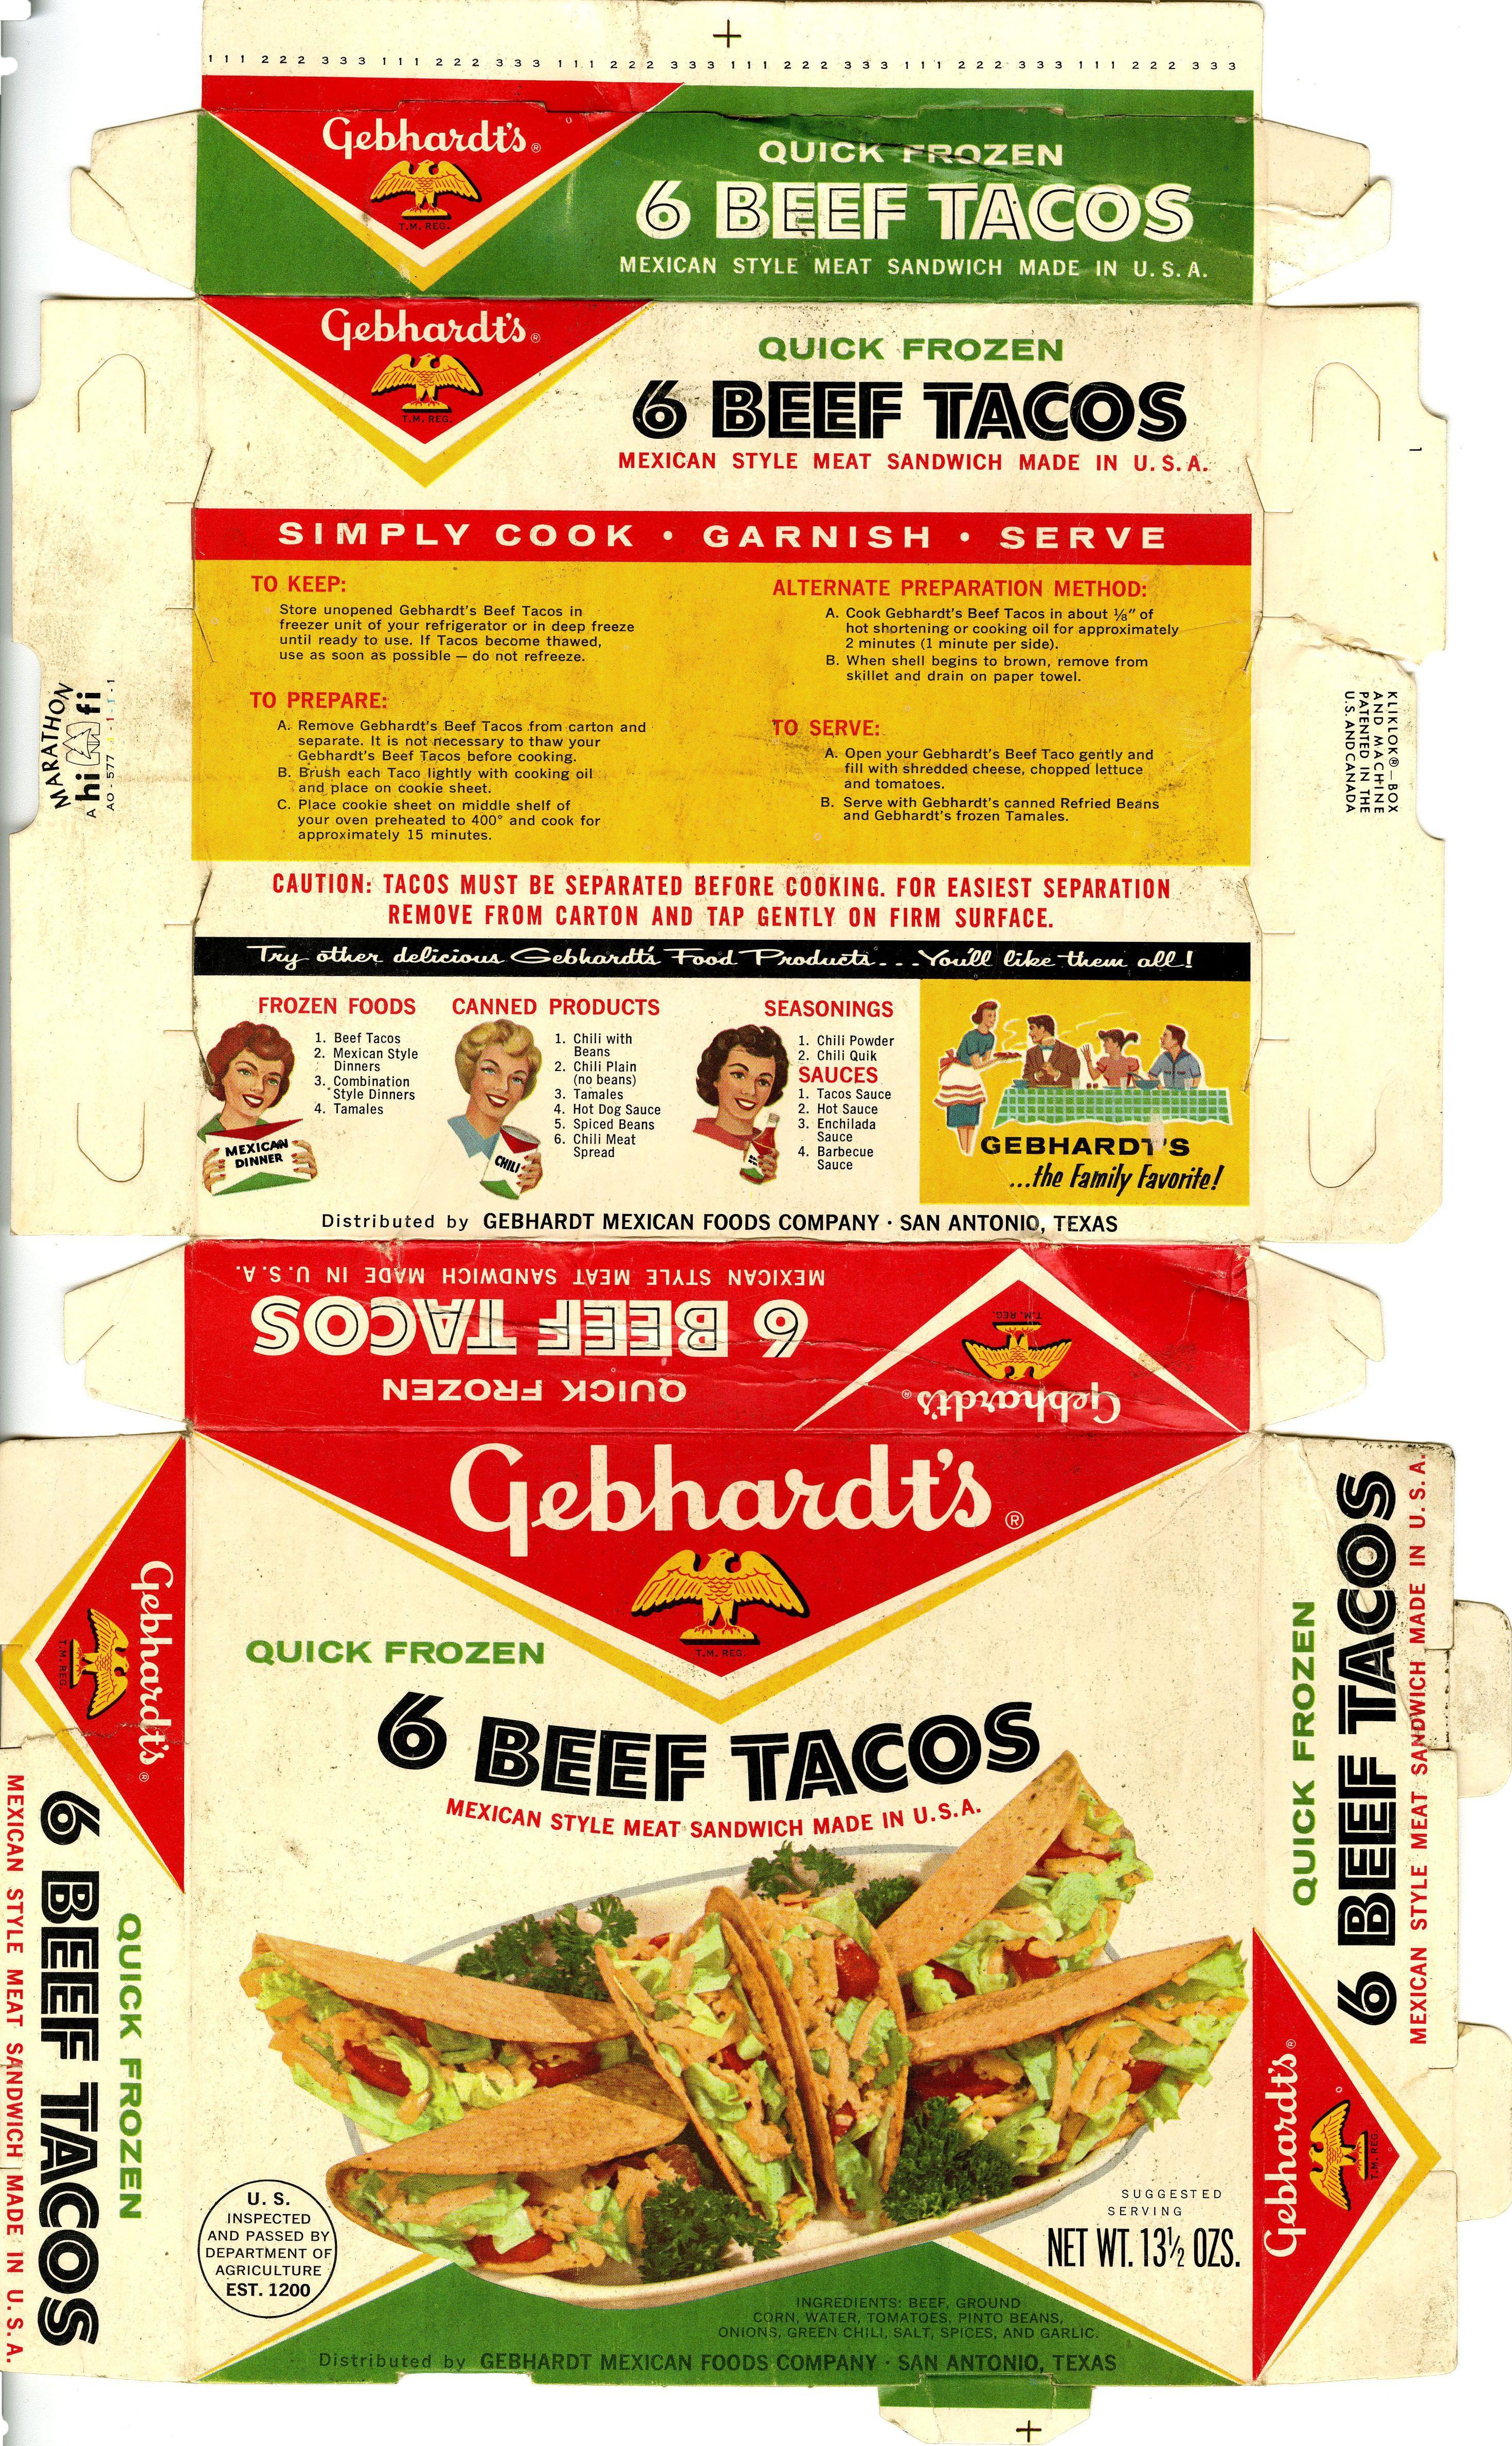 Simply cook, garnish and serve #utsalibraries #gebhardt #tacos #beef #beeftacos #mexicanfood lib.utsa.edu/gebhardt